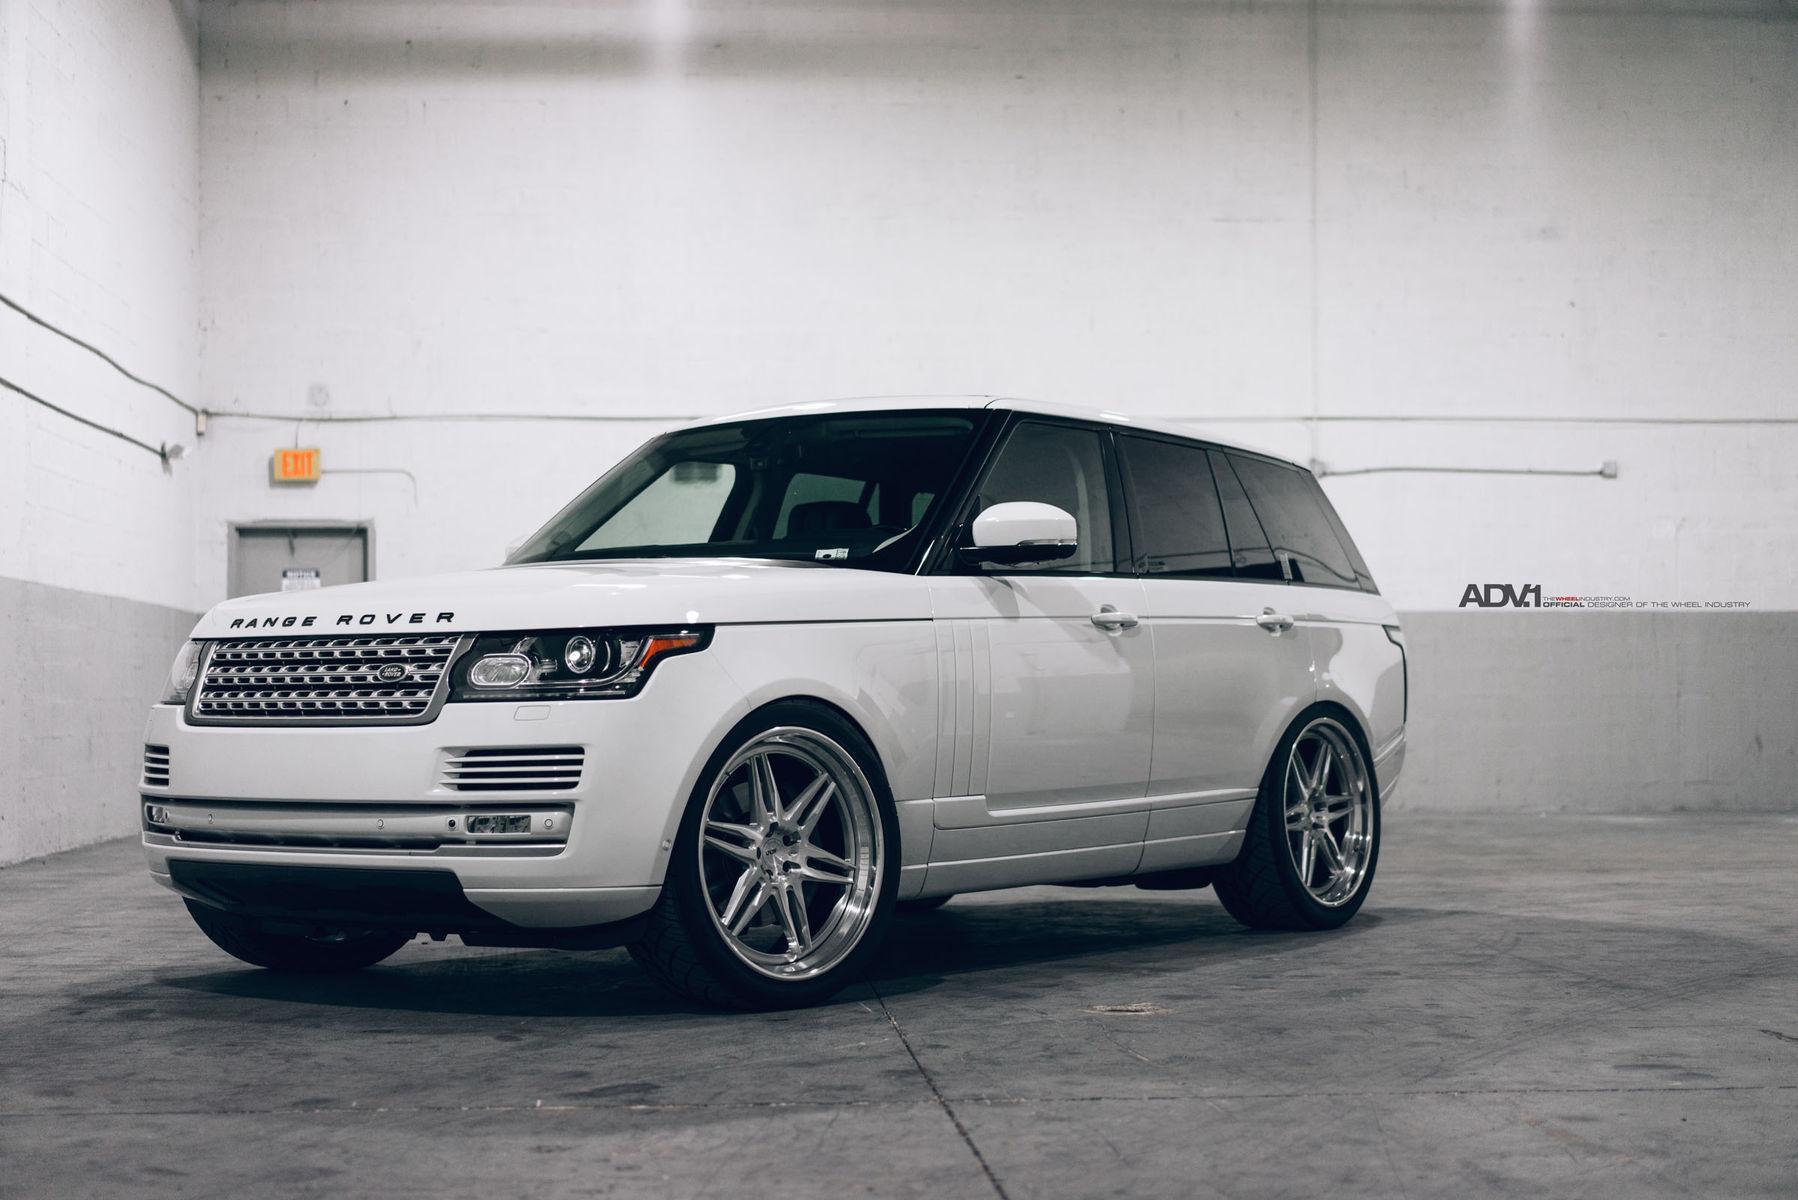 Land Rover Range Rover | Ranger Rover HSC | Worlds First 24in Step Lip